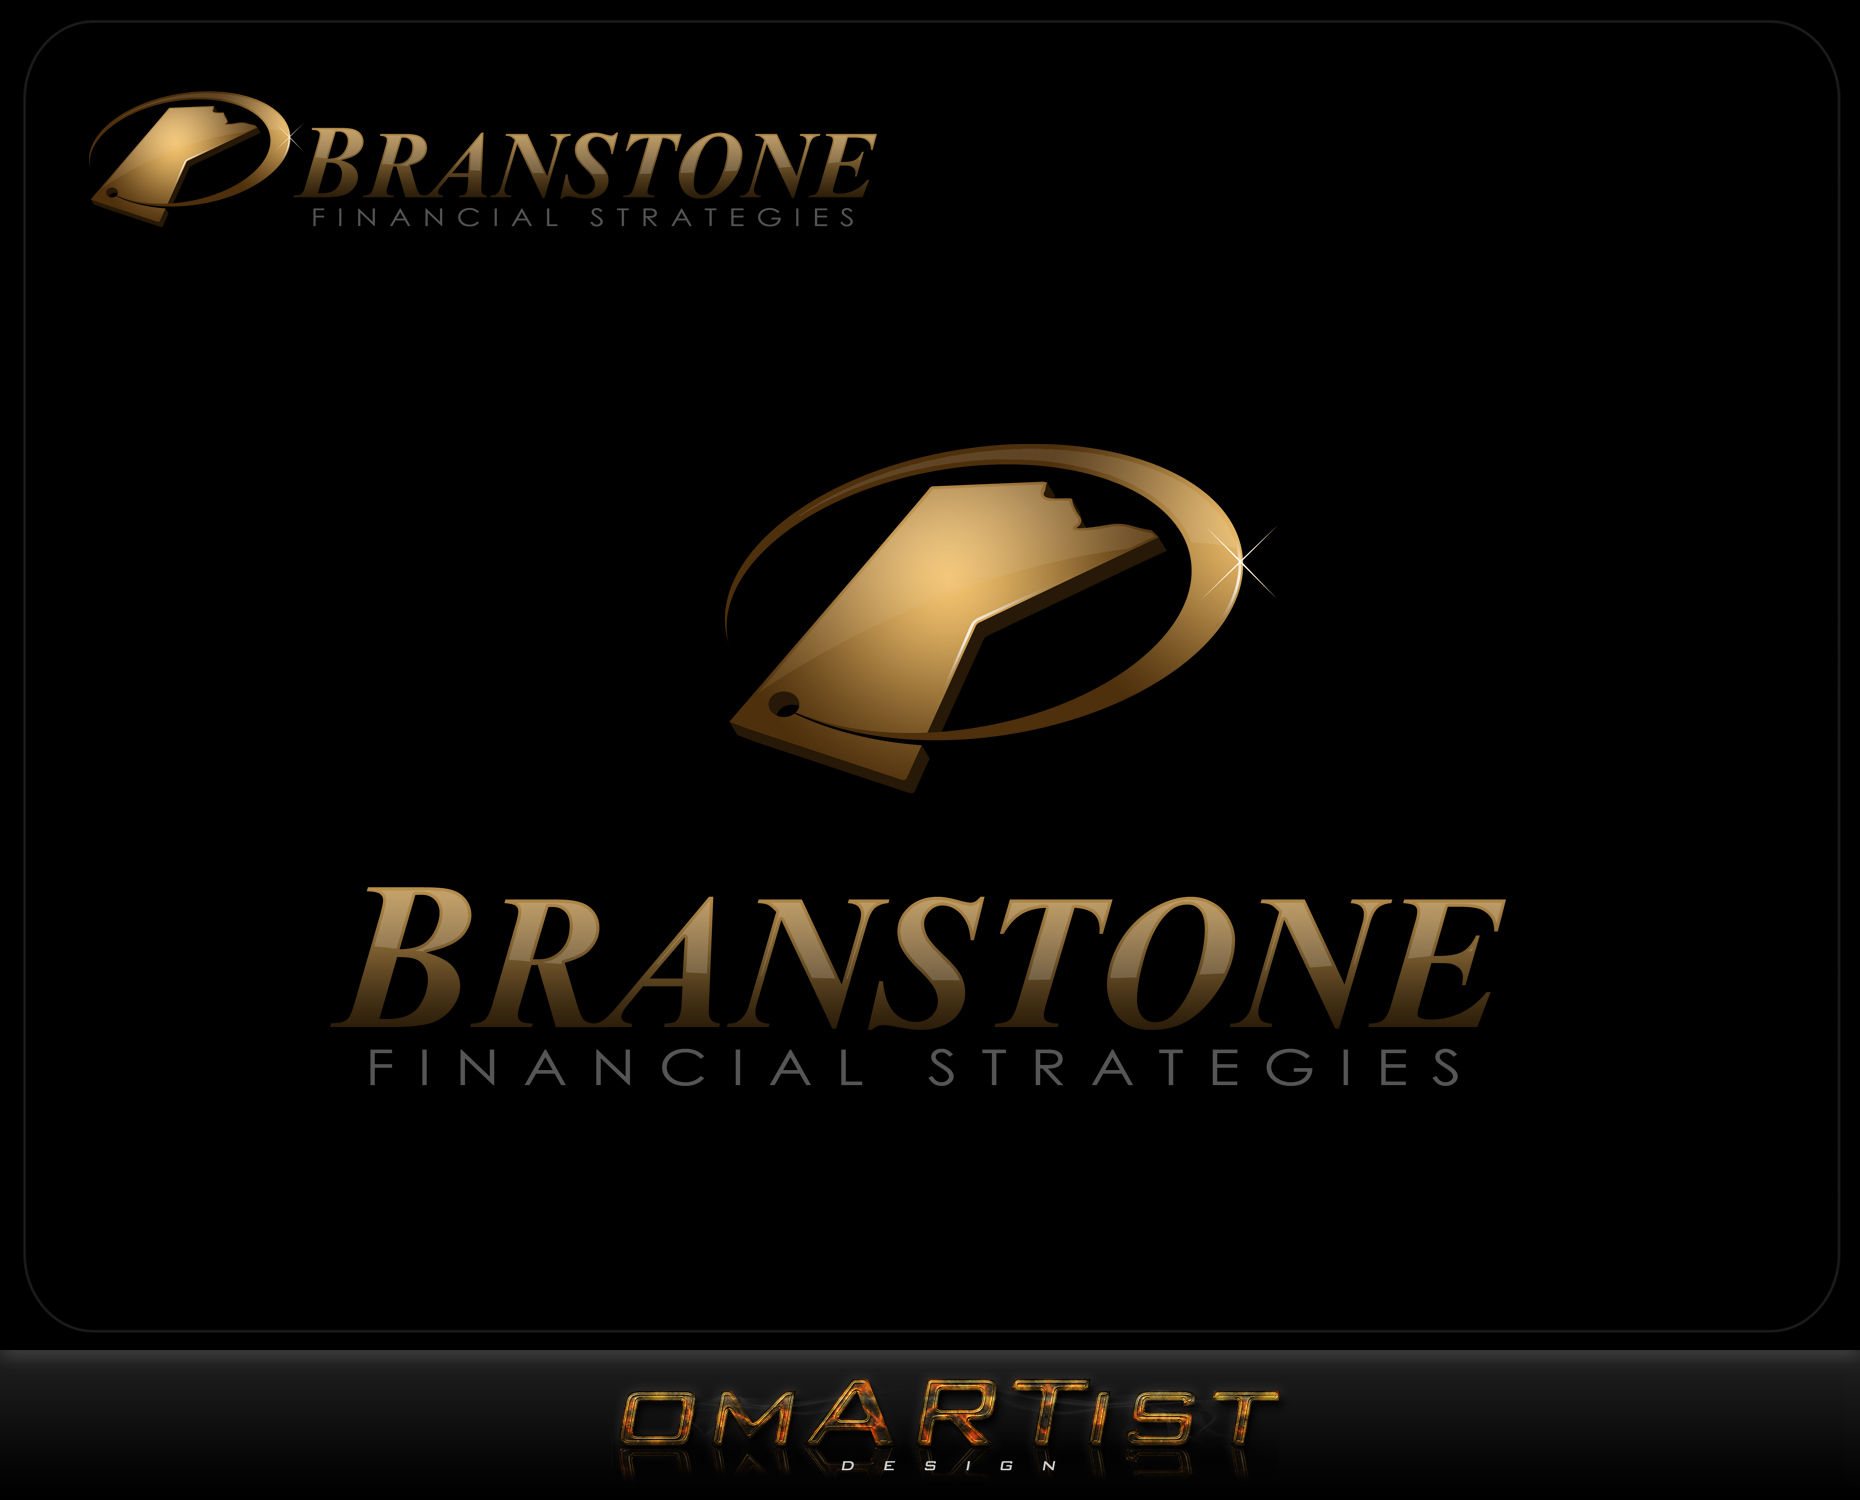 Logo Design by omARTist - Entry No. 113 in the Logo Design Contest Inspiring Logo Design for Branstone Financial Strategies.